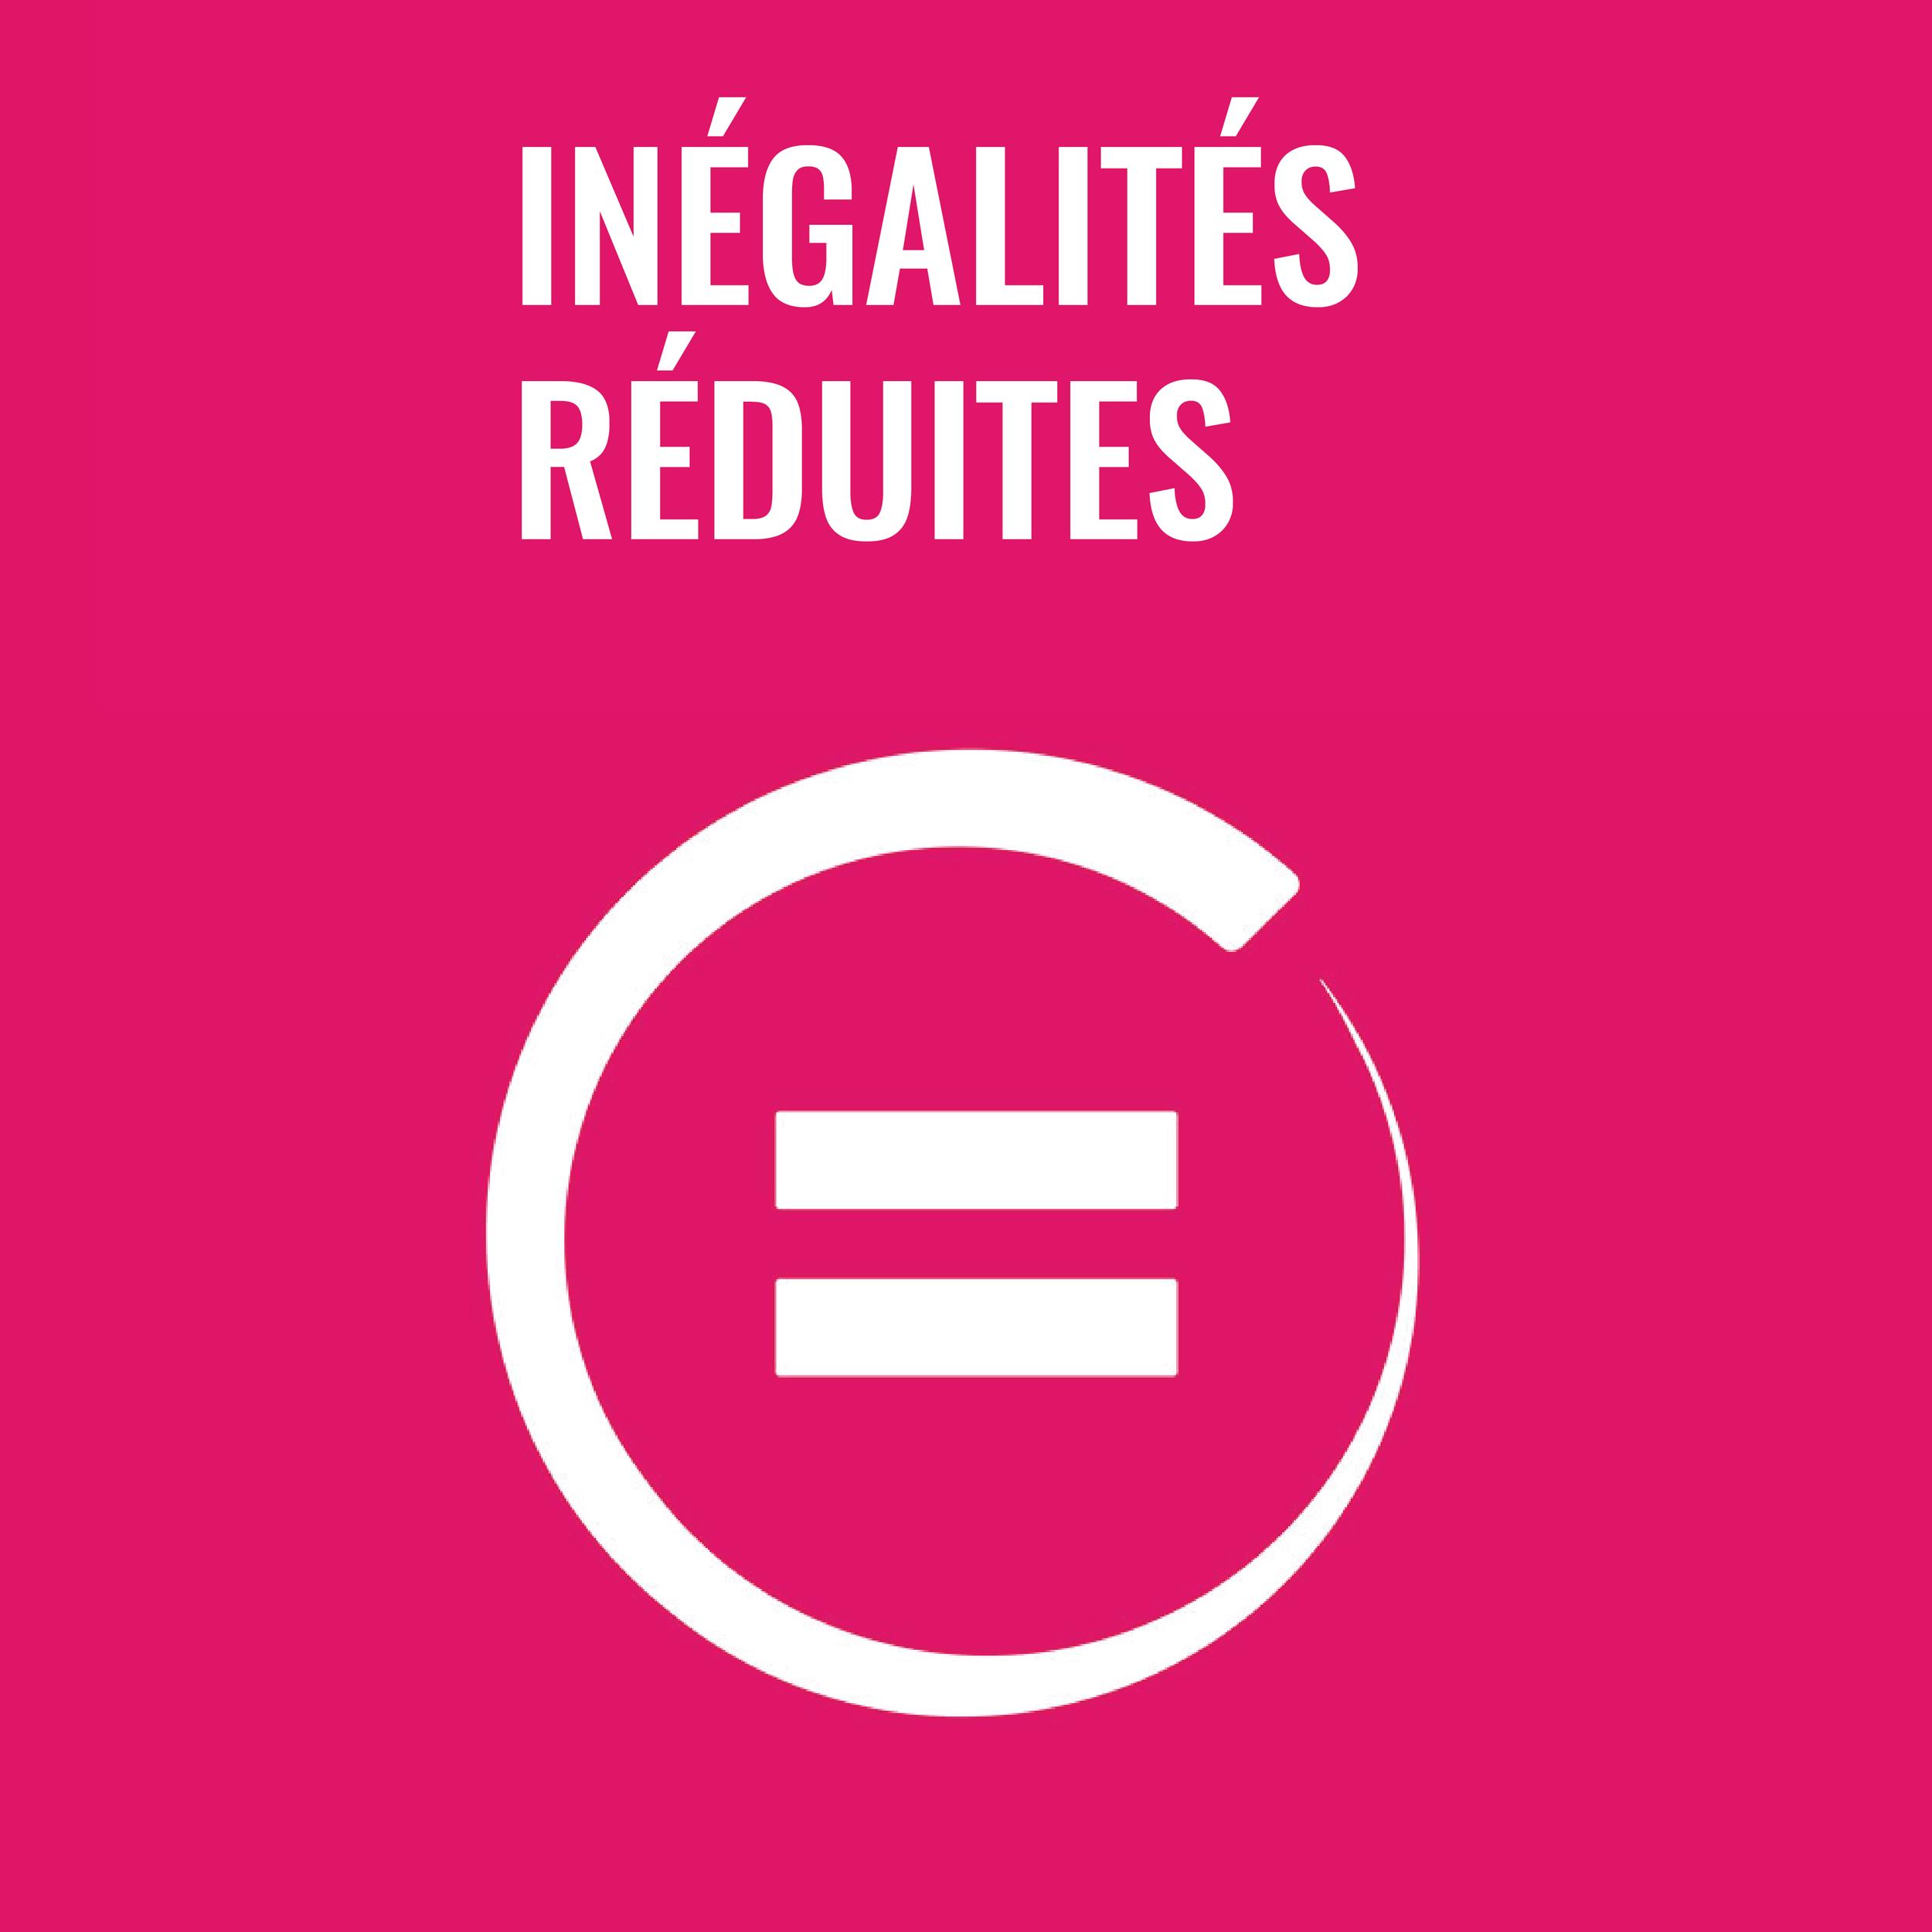 Inequalities-01.png